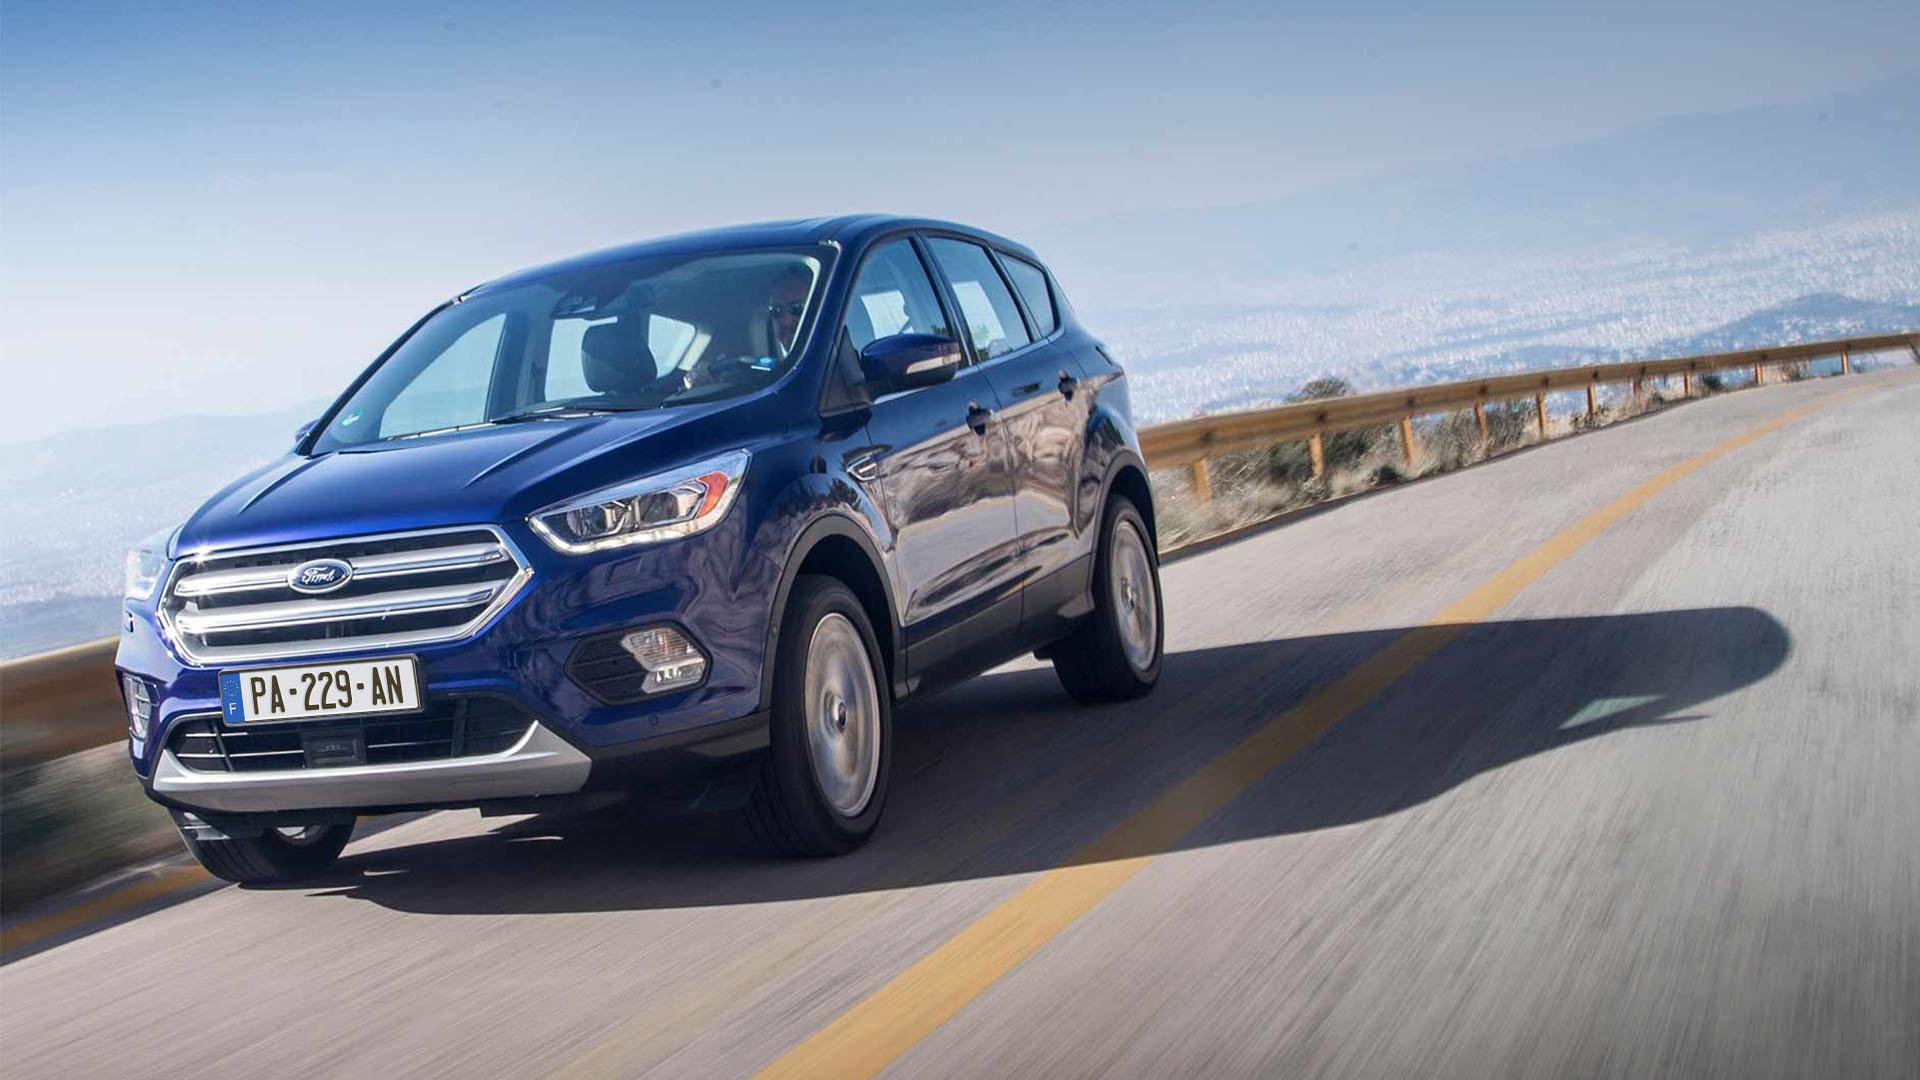 Le nouveau Ford Kuga chez EDA